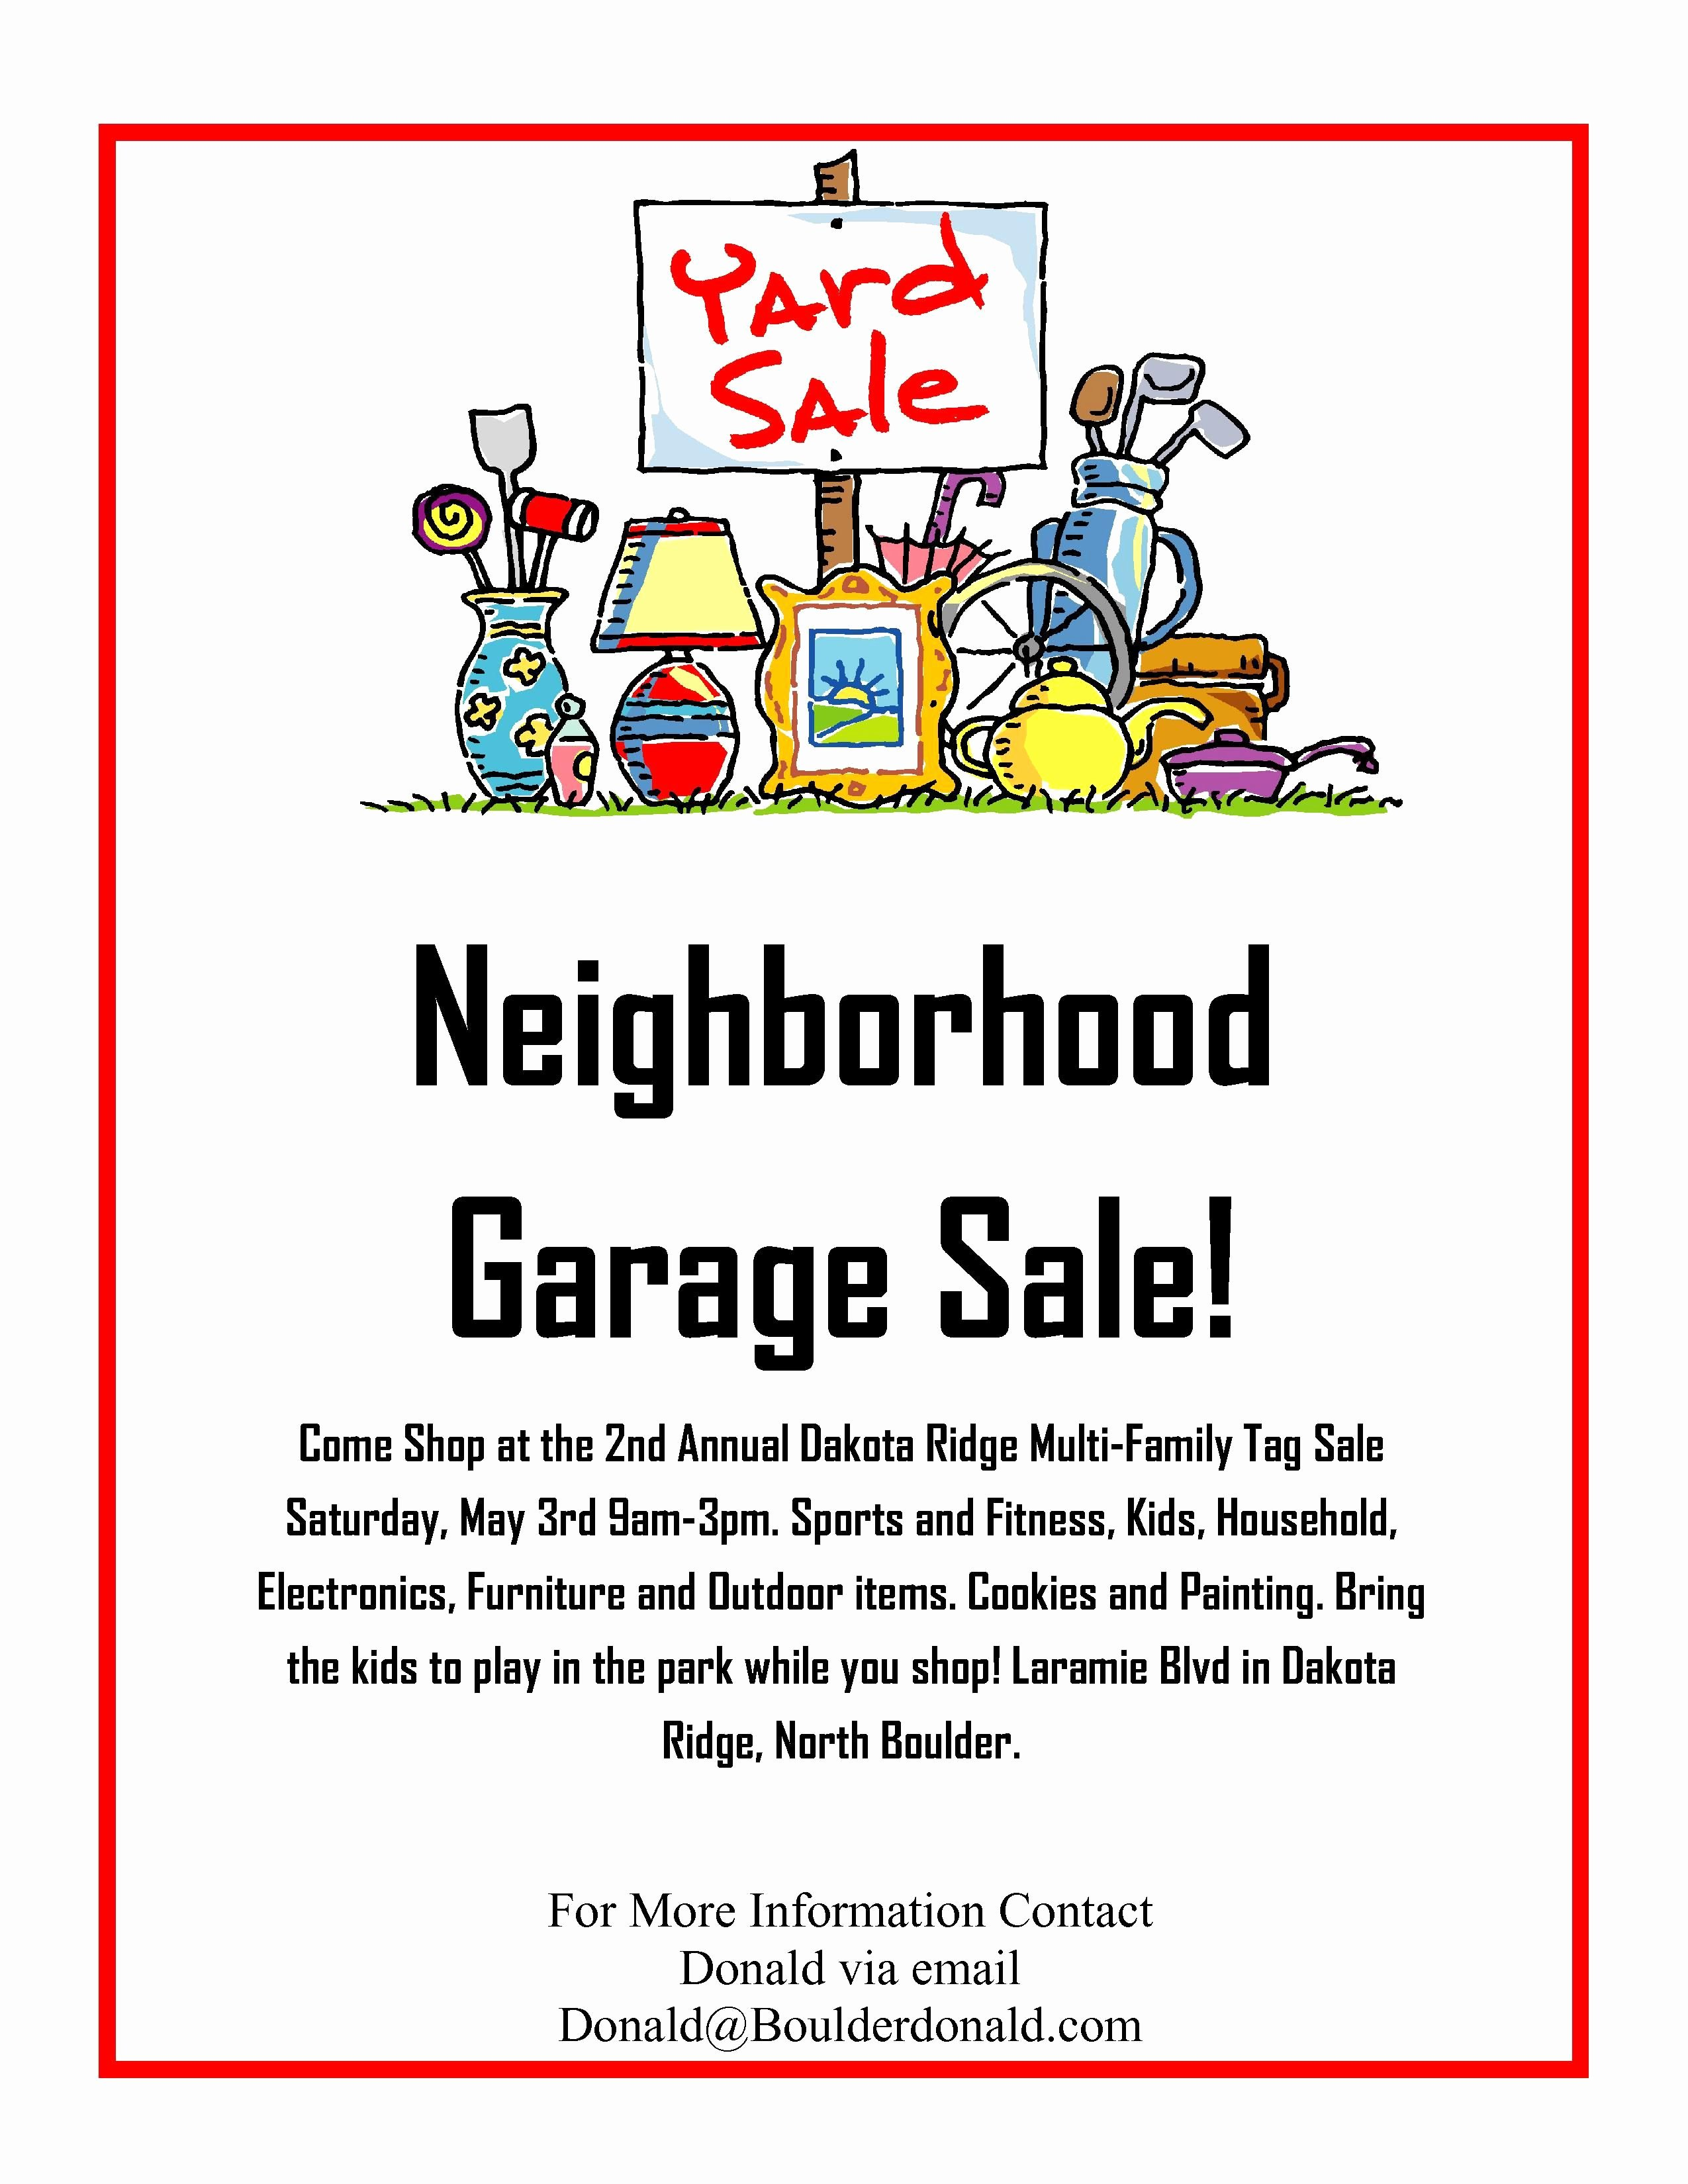 Yard Sale Sign Template Beautiful Dakota Ridge Munity Garage Sale May 3rd 2014